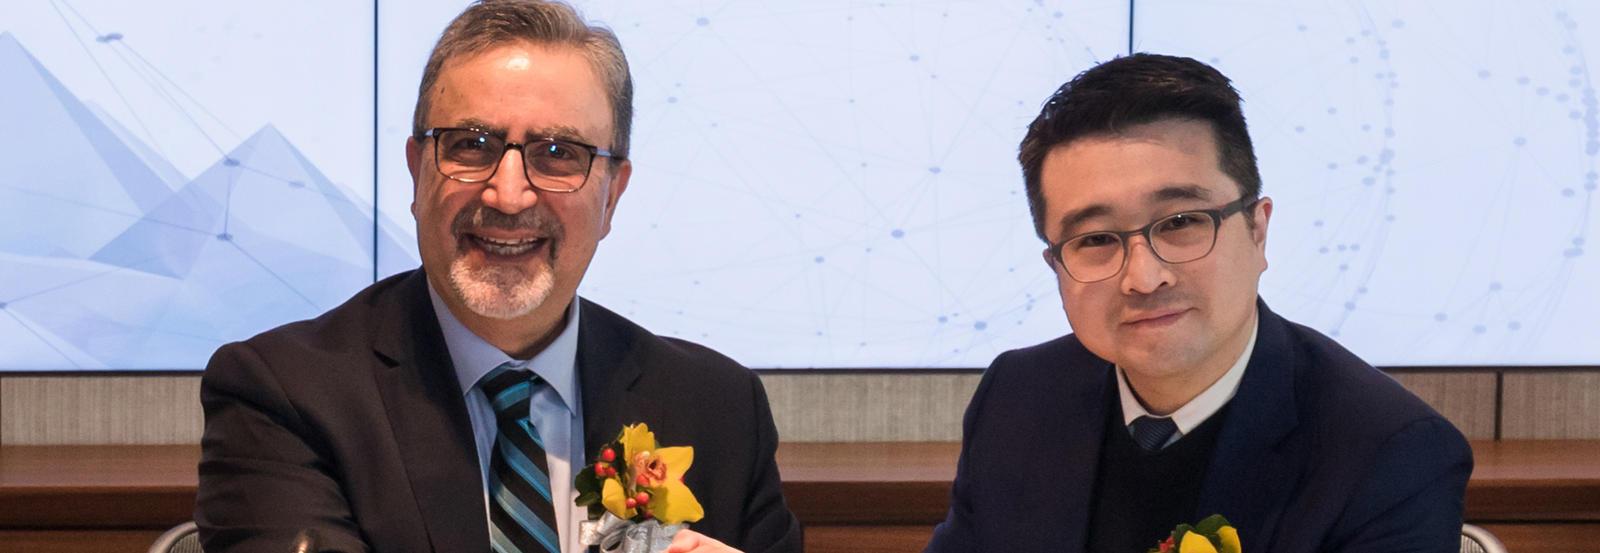 Alumnus Calvin Choi and Feridun